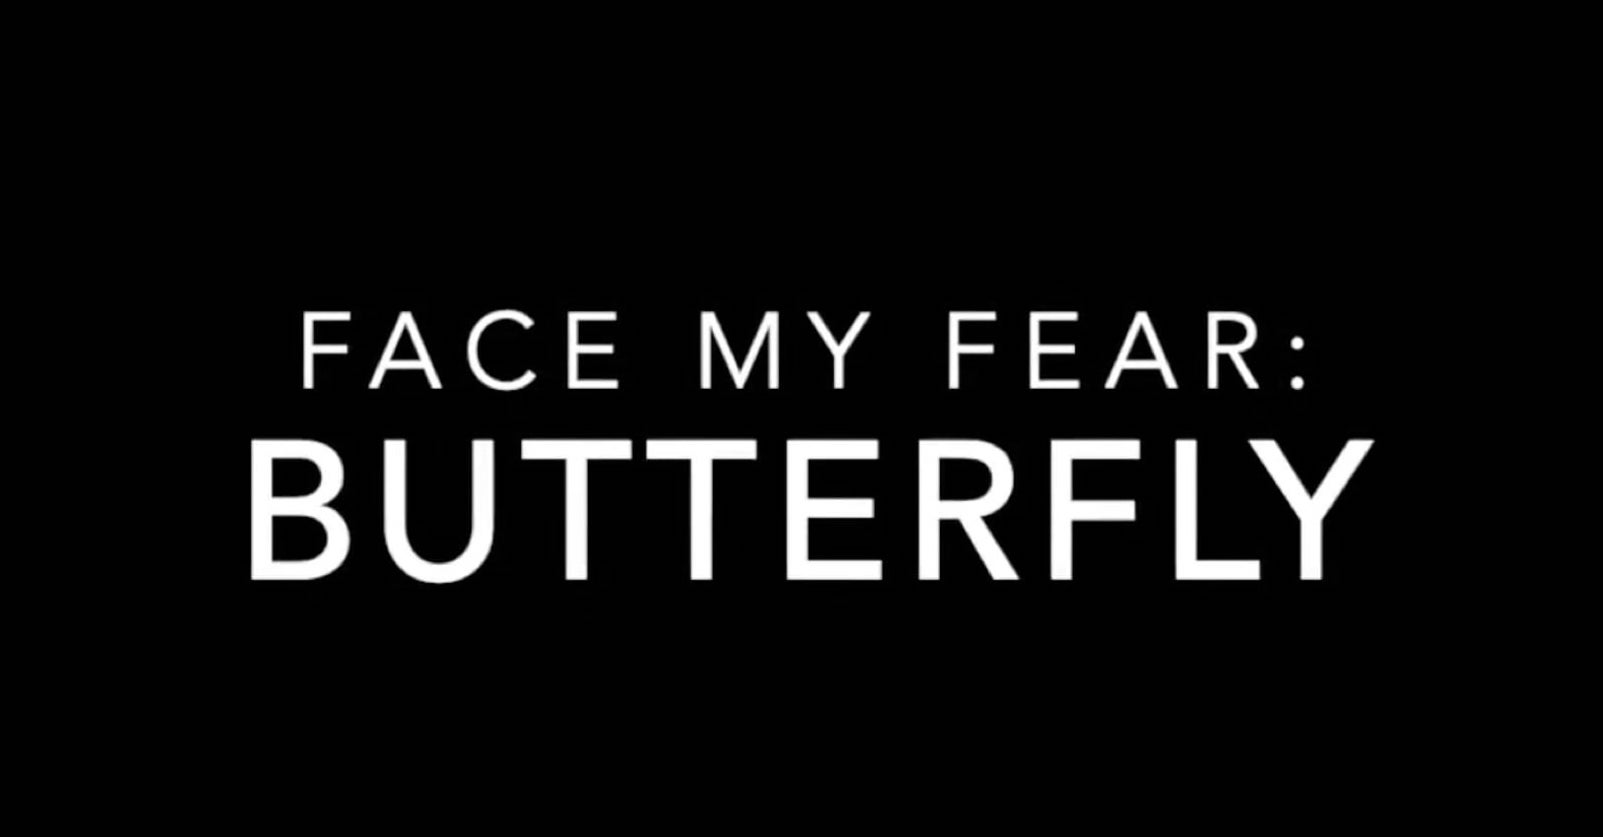 Face my Fear: Butterfly by Joshua Howell-Leyer